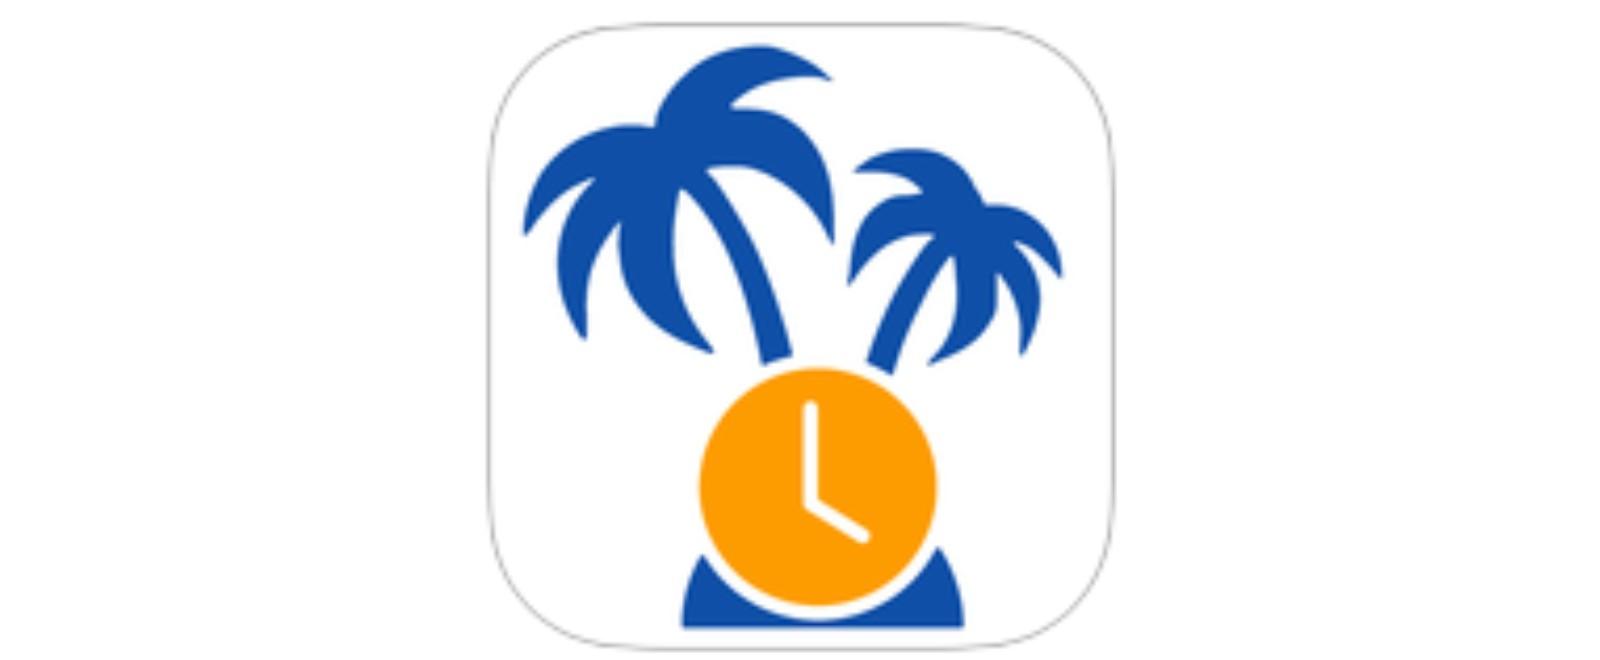 Retirement Planning App Built Using the FileMaker Platform